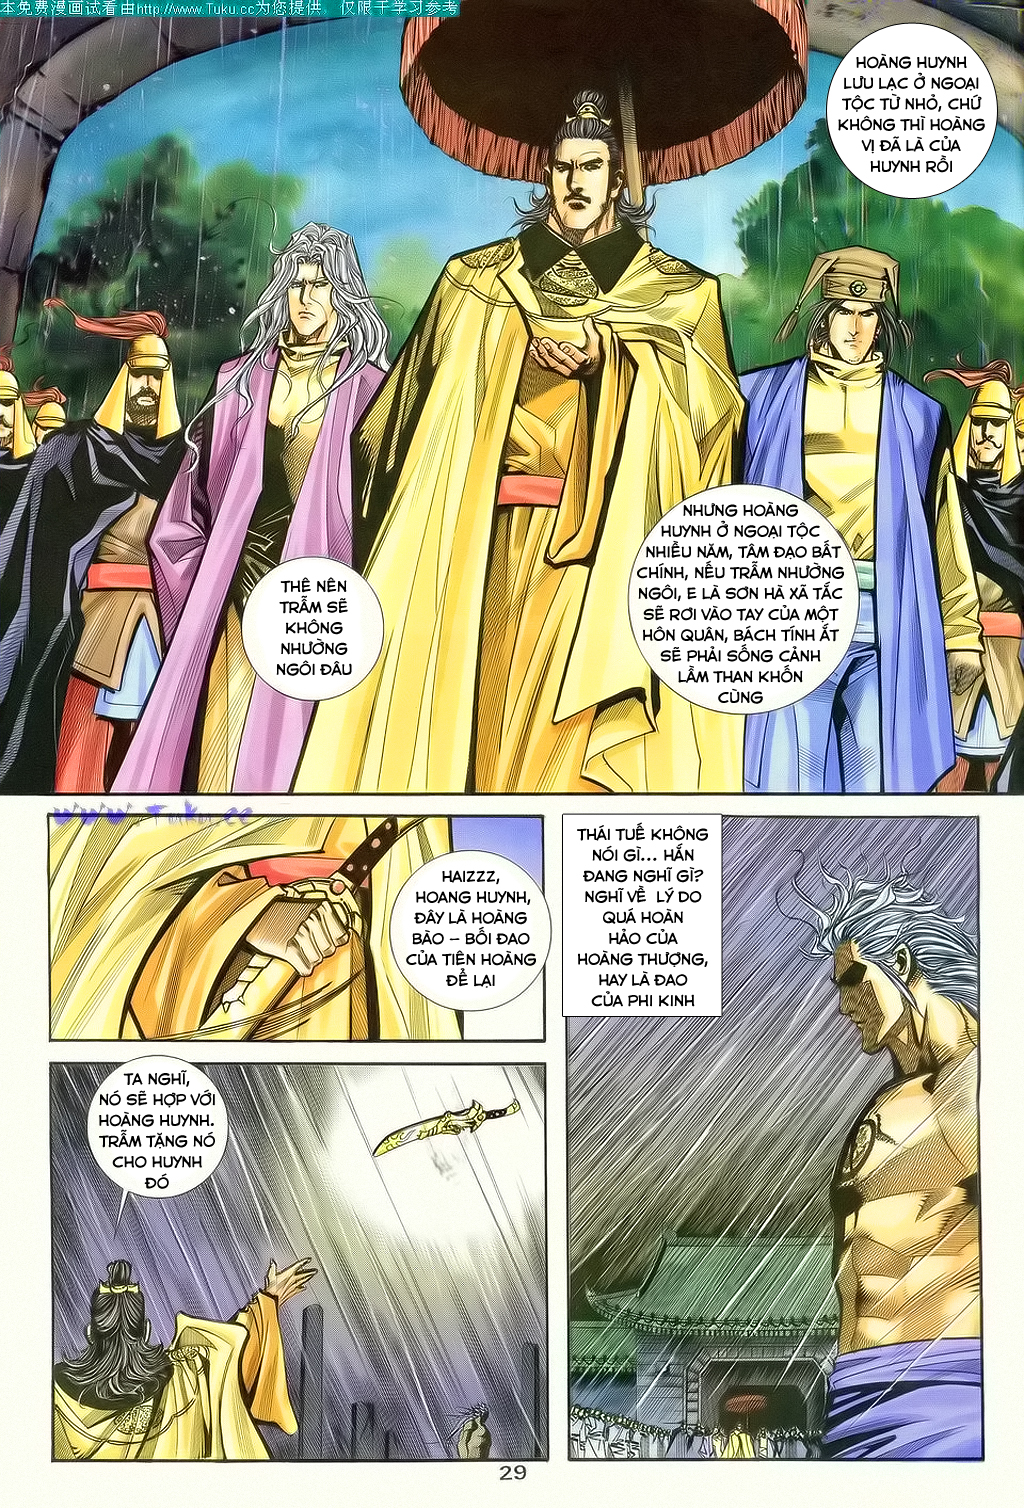 xem truyen moi - Bá Đao - Chapter 130